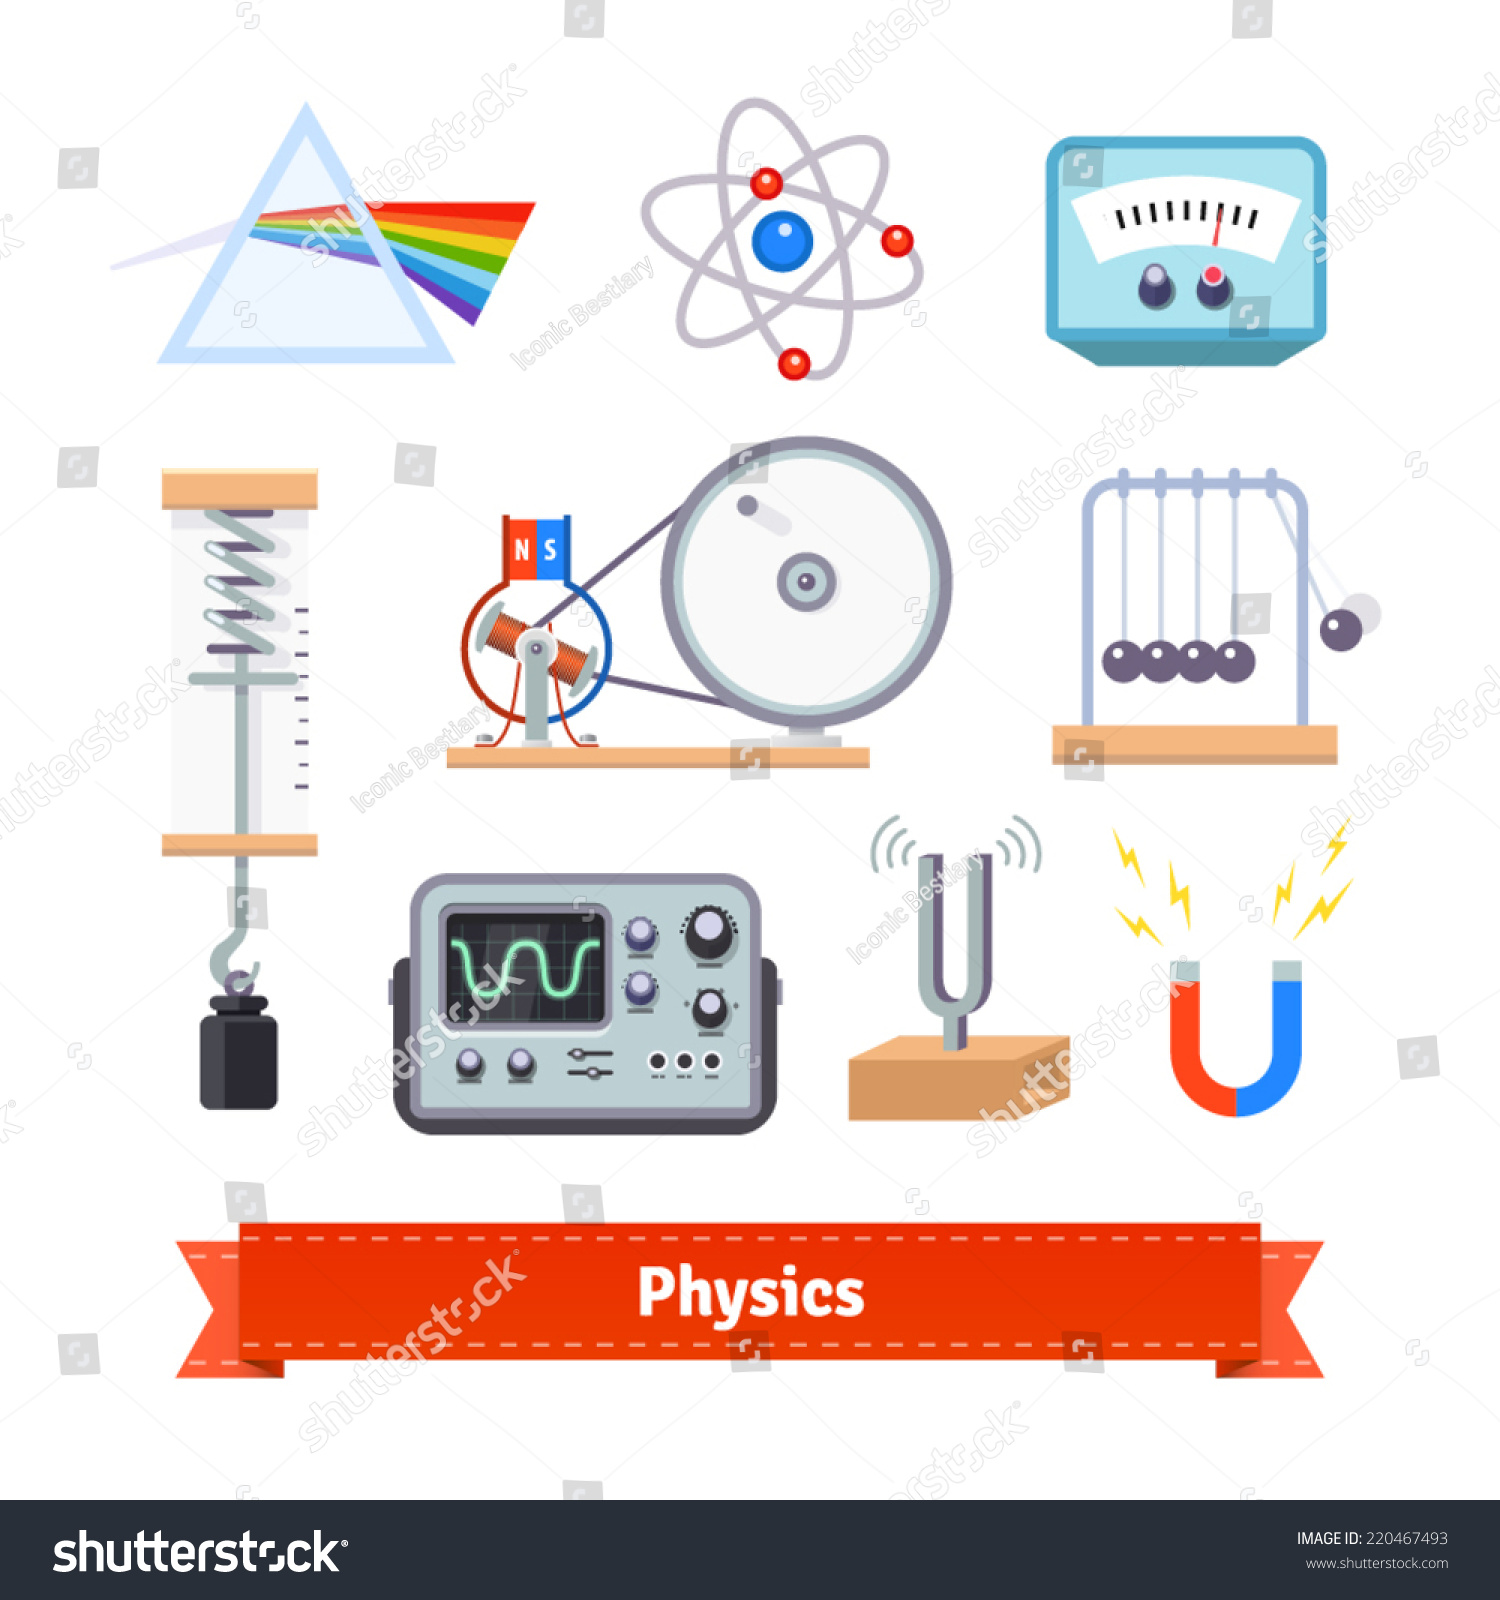 Classroom Logo Design : Physics classroom equipment colourful flat icon set eps